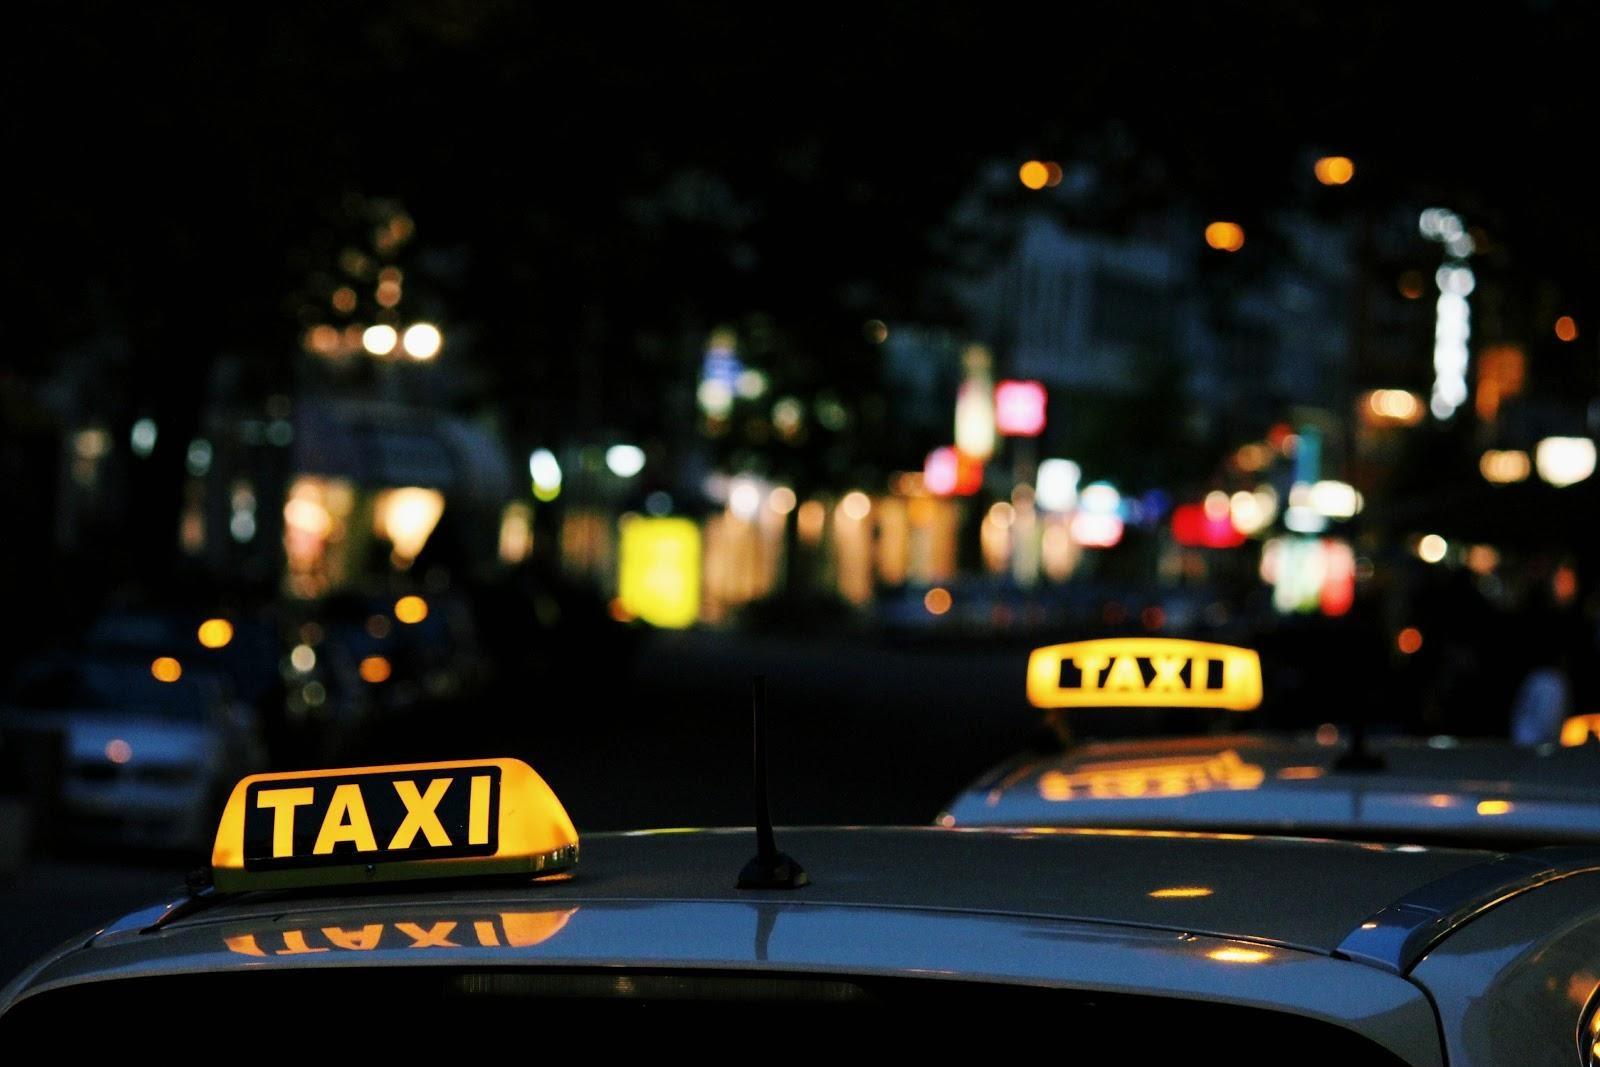 Berner Taxi service